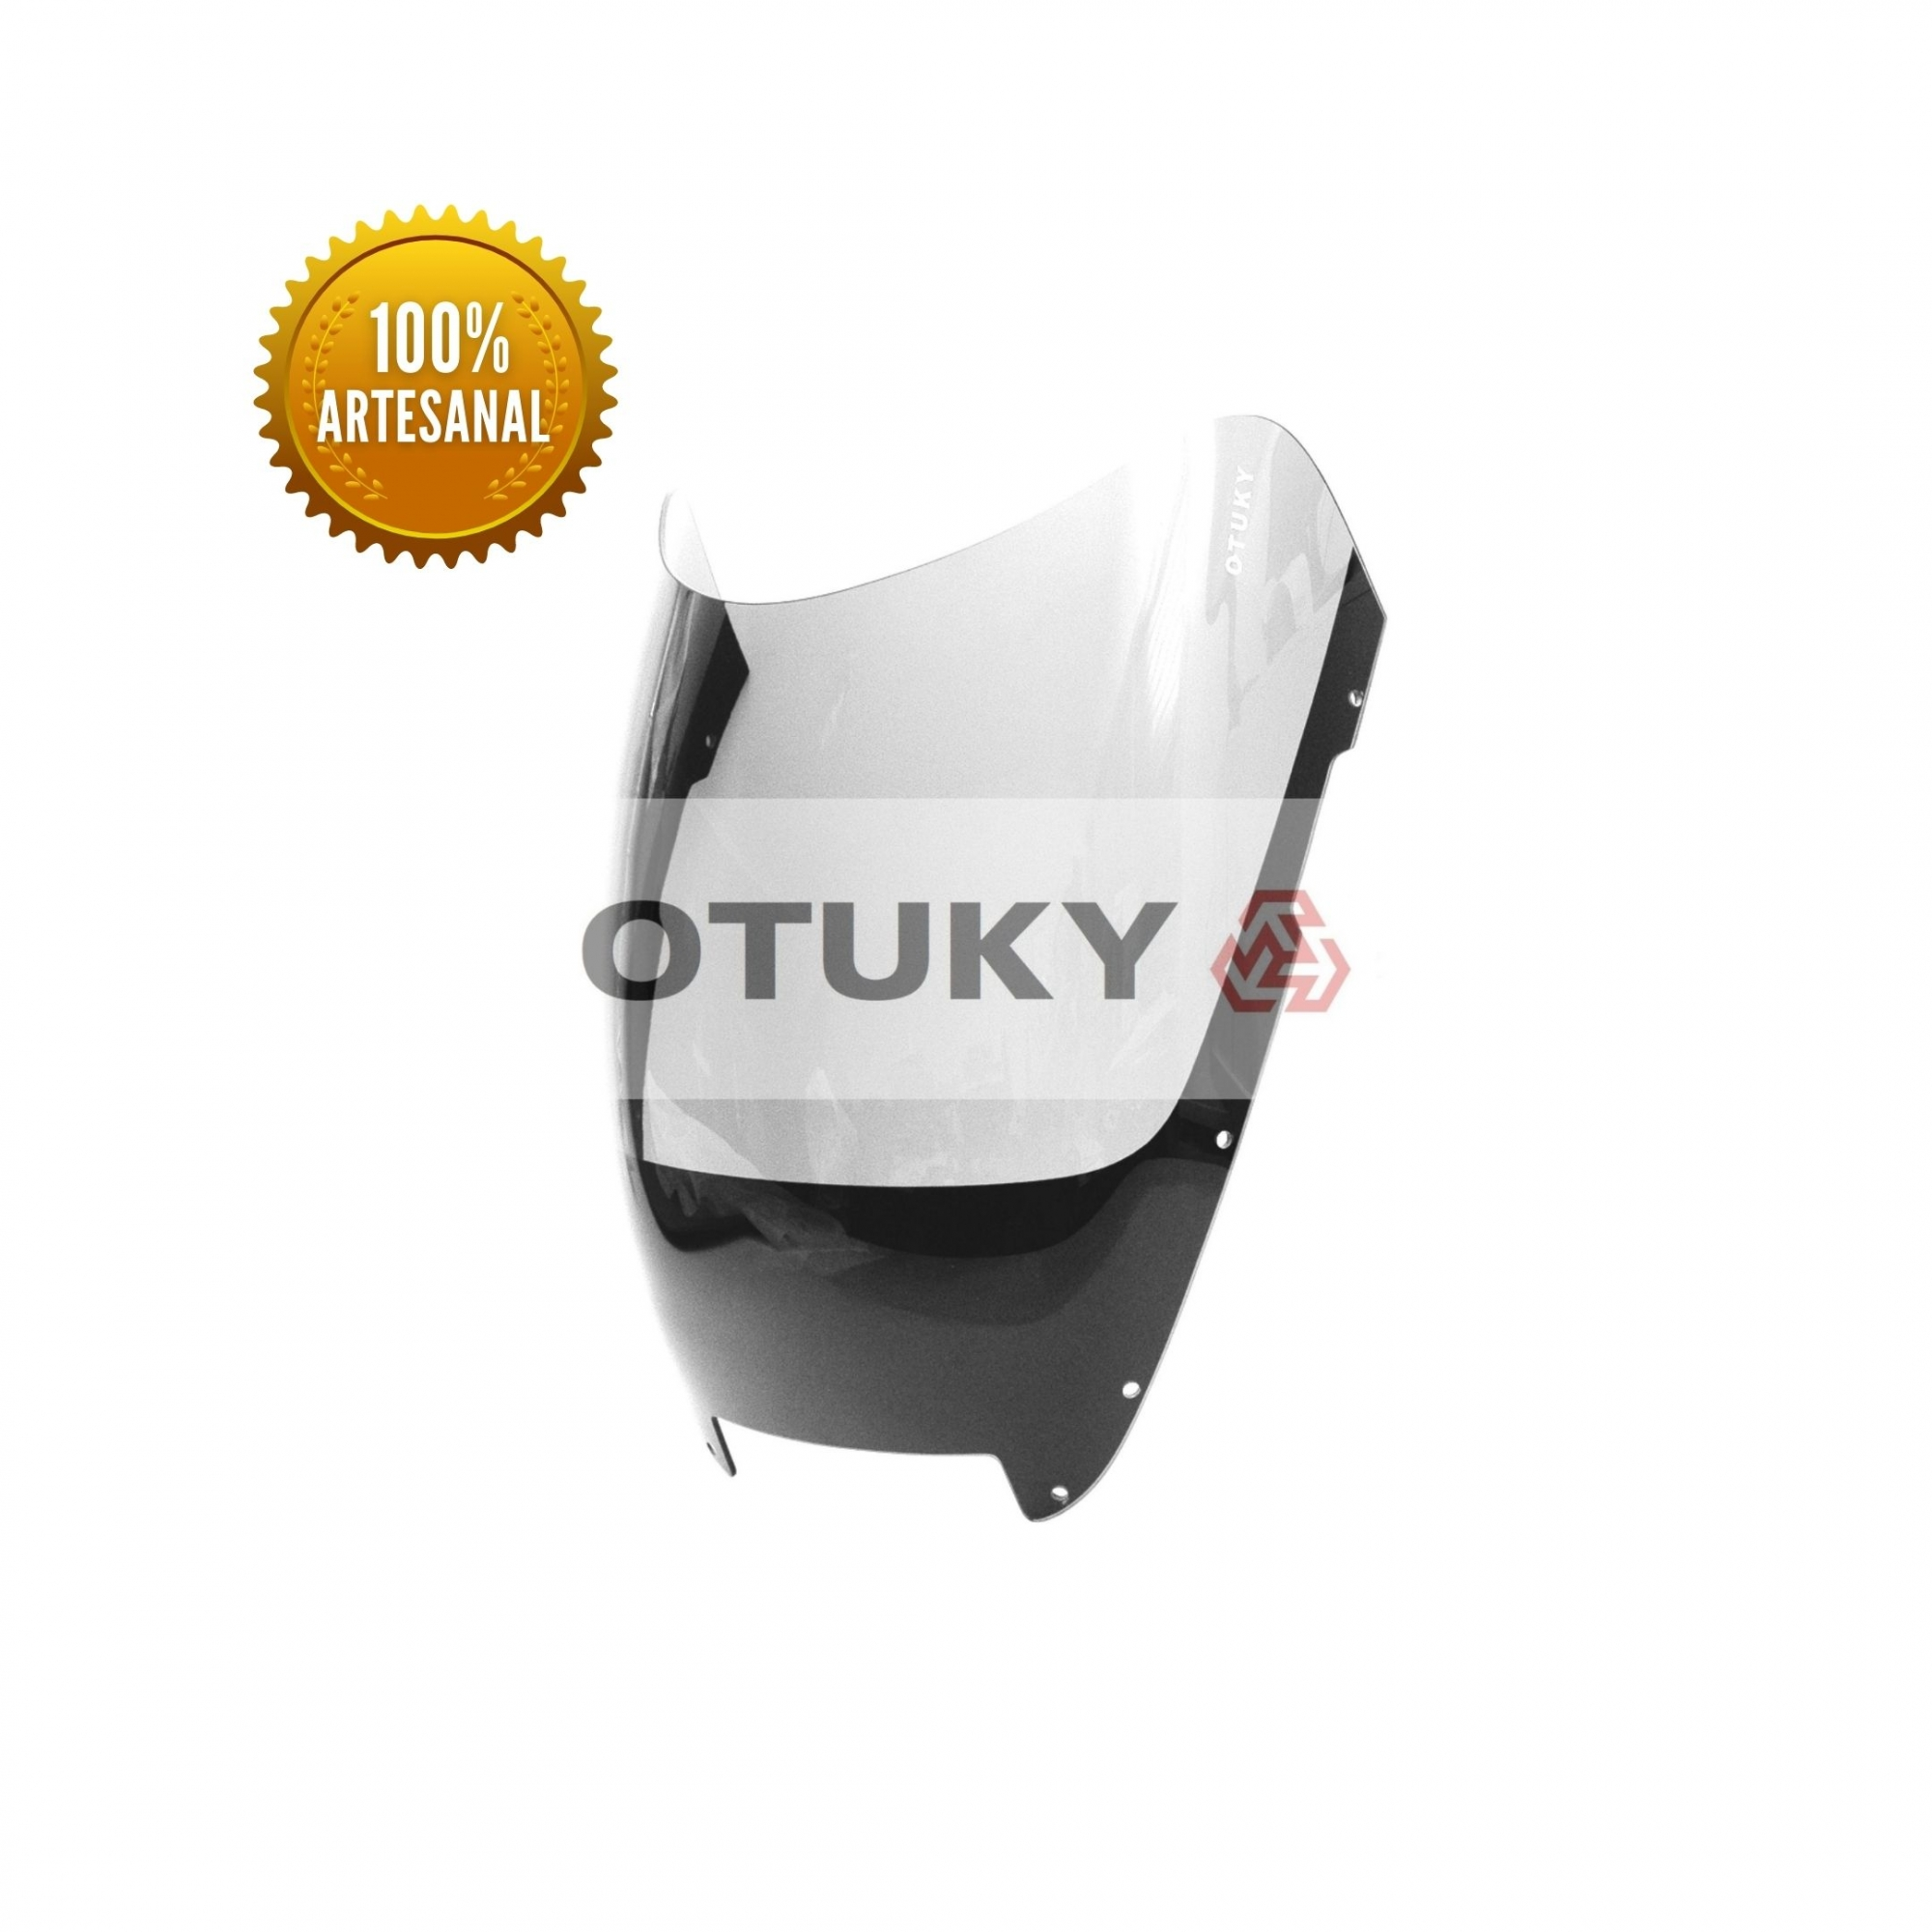 Bolha para Moto CBX 750 Indy Otuky Cristal